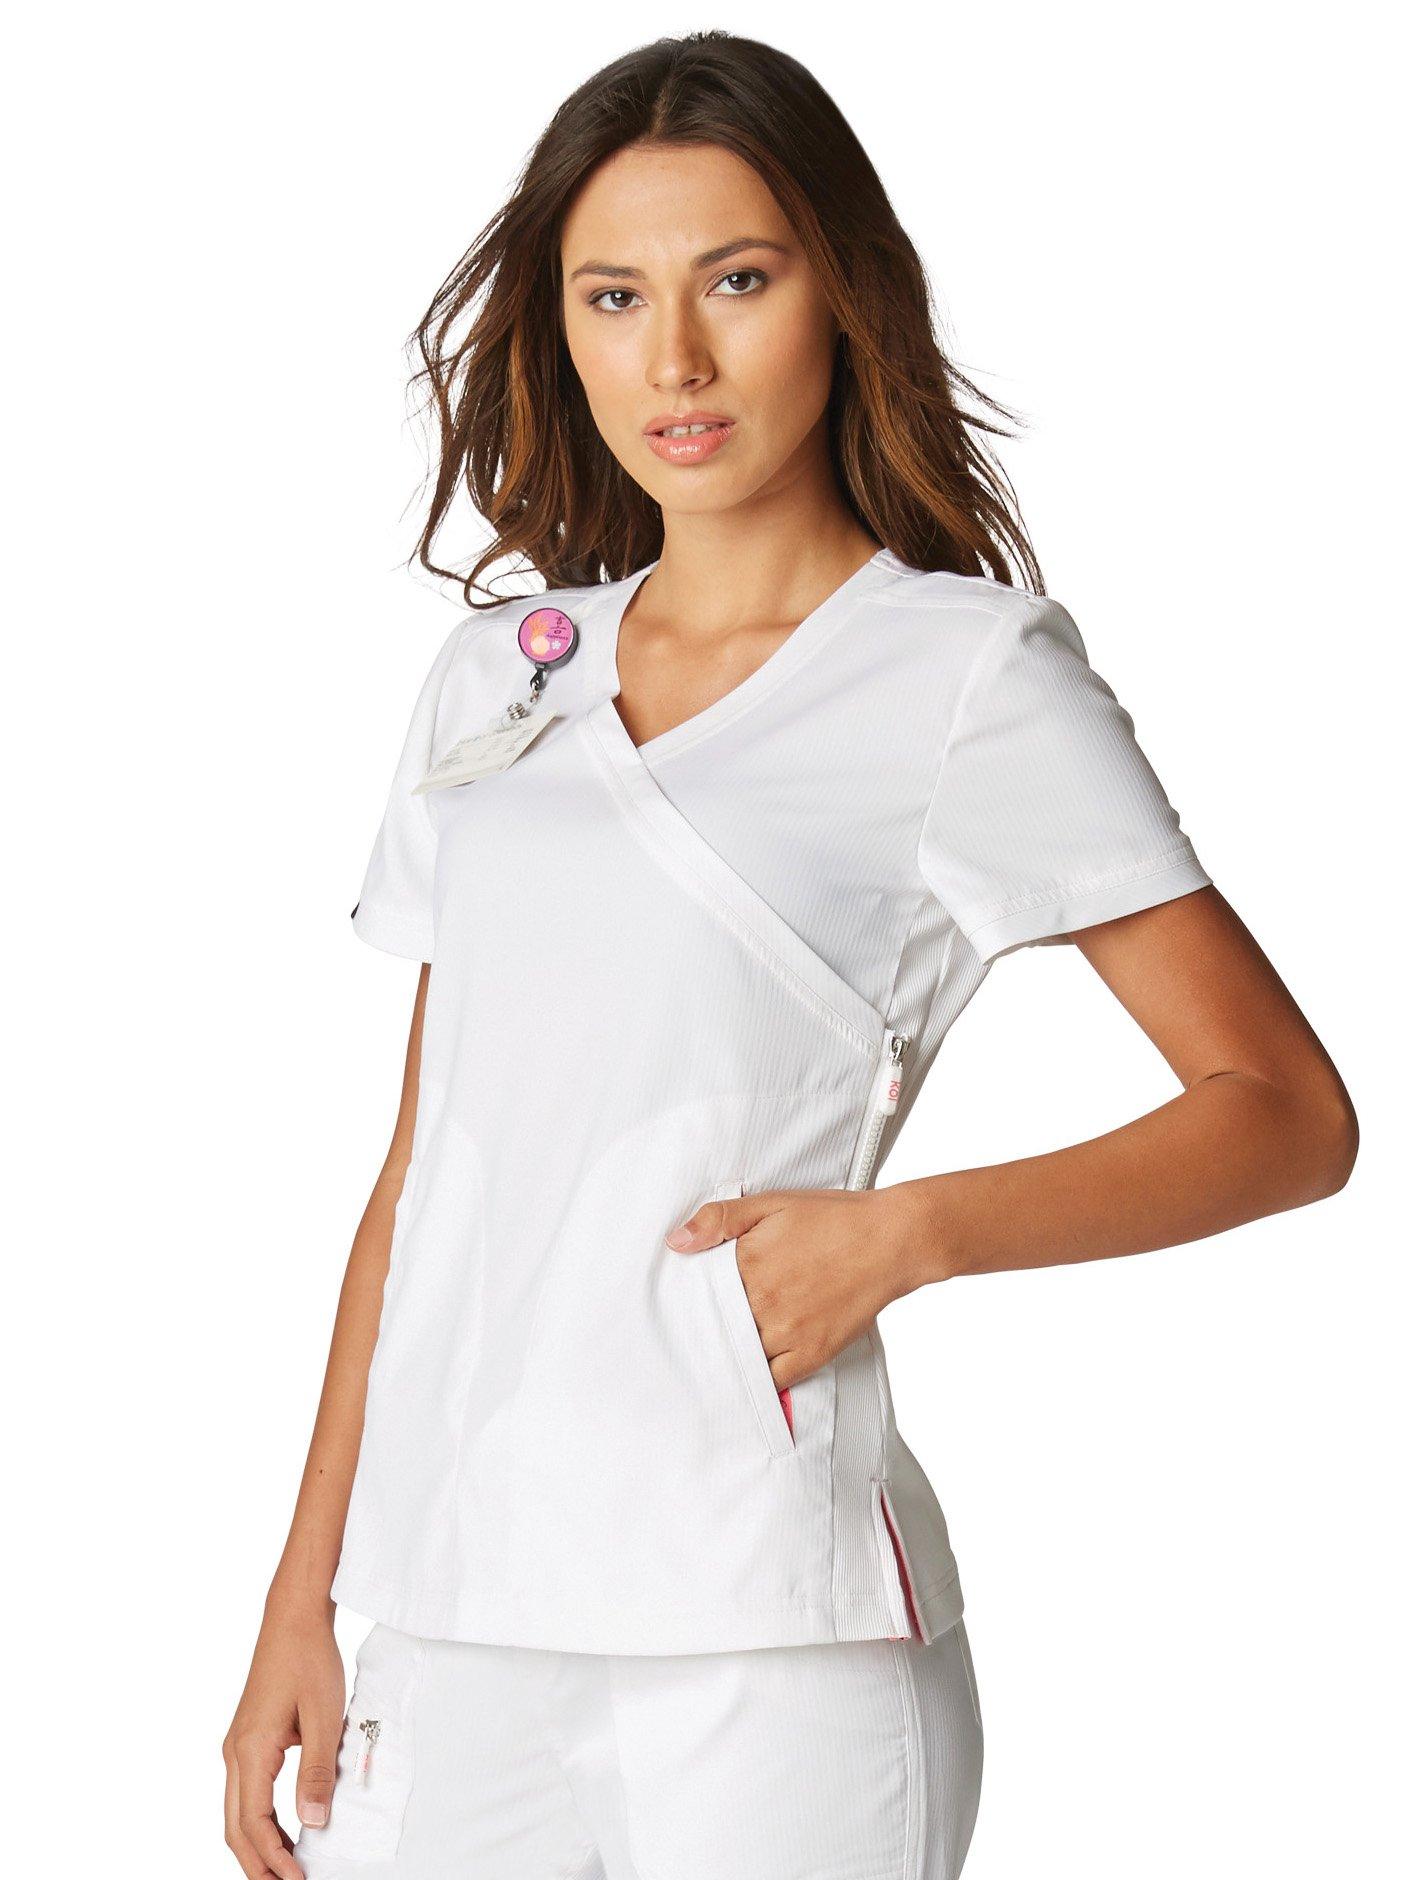 KOI Lite Women's Philosophy 316 Mock Wrap Side Zipper Scrub Top- White- Small